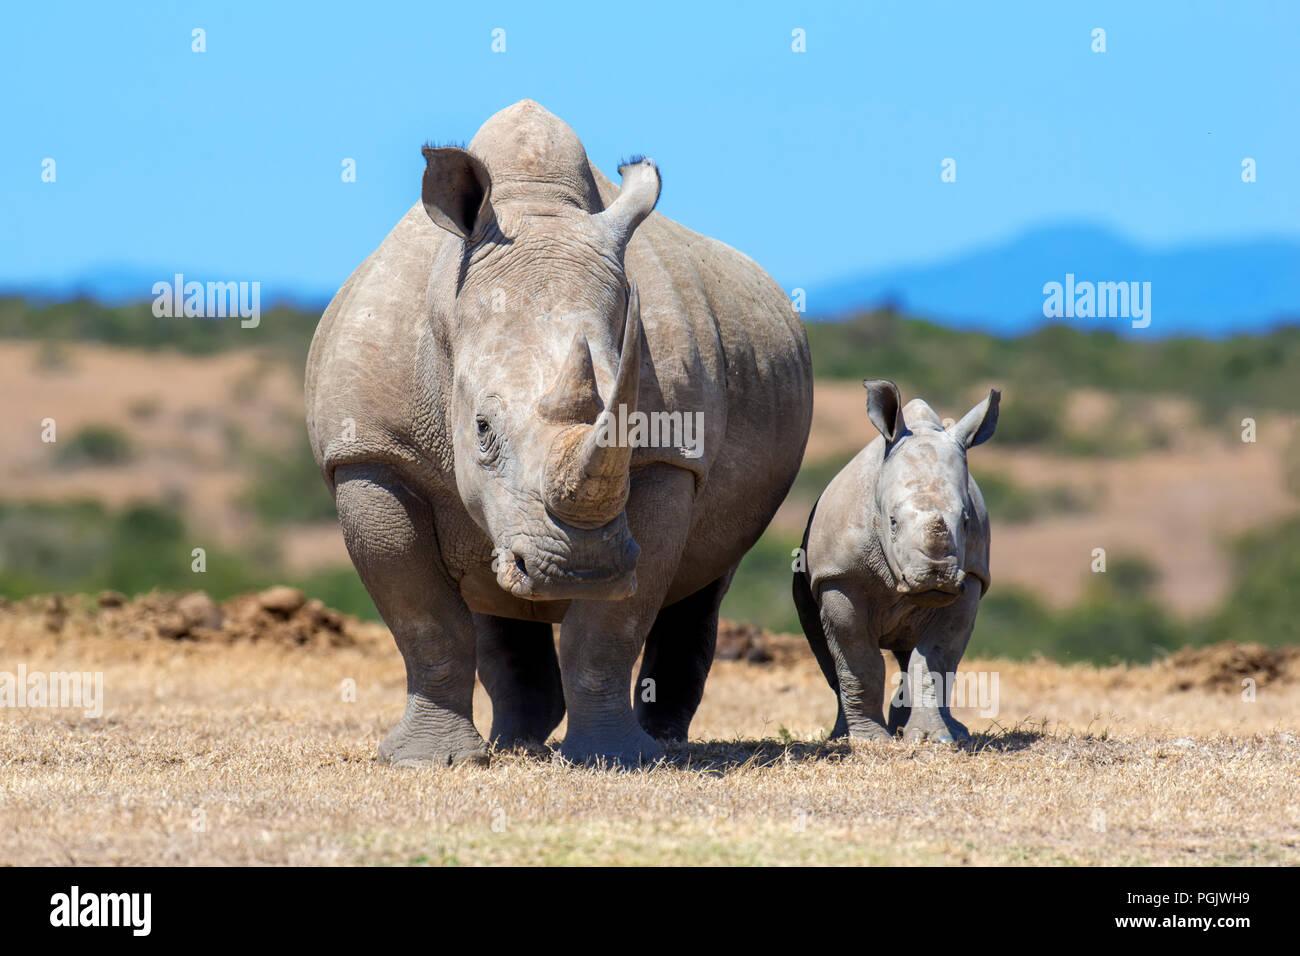 African white rhino, parco nazionale del Kenya Immagini Stock